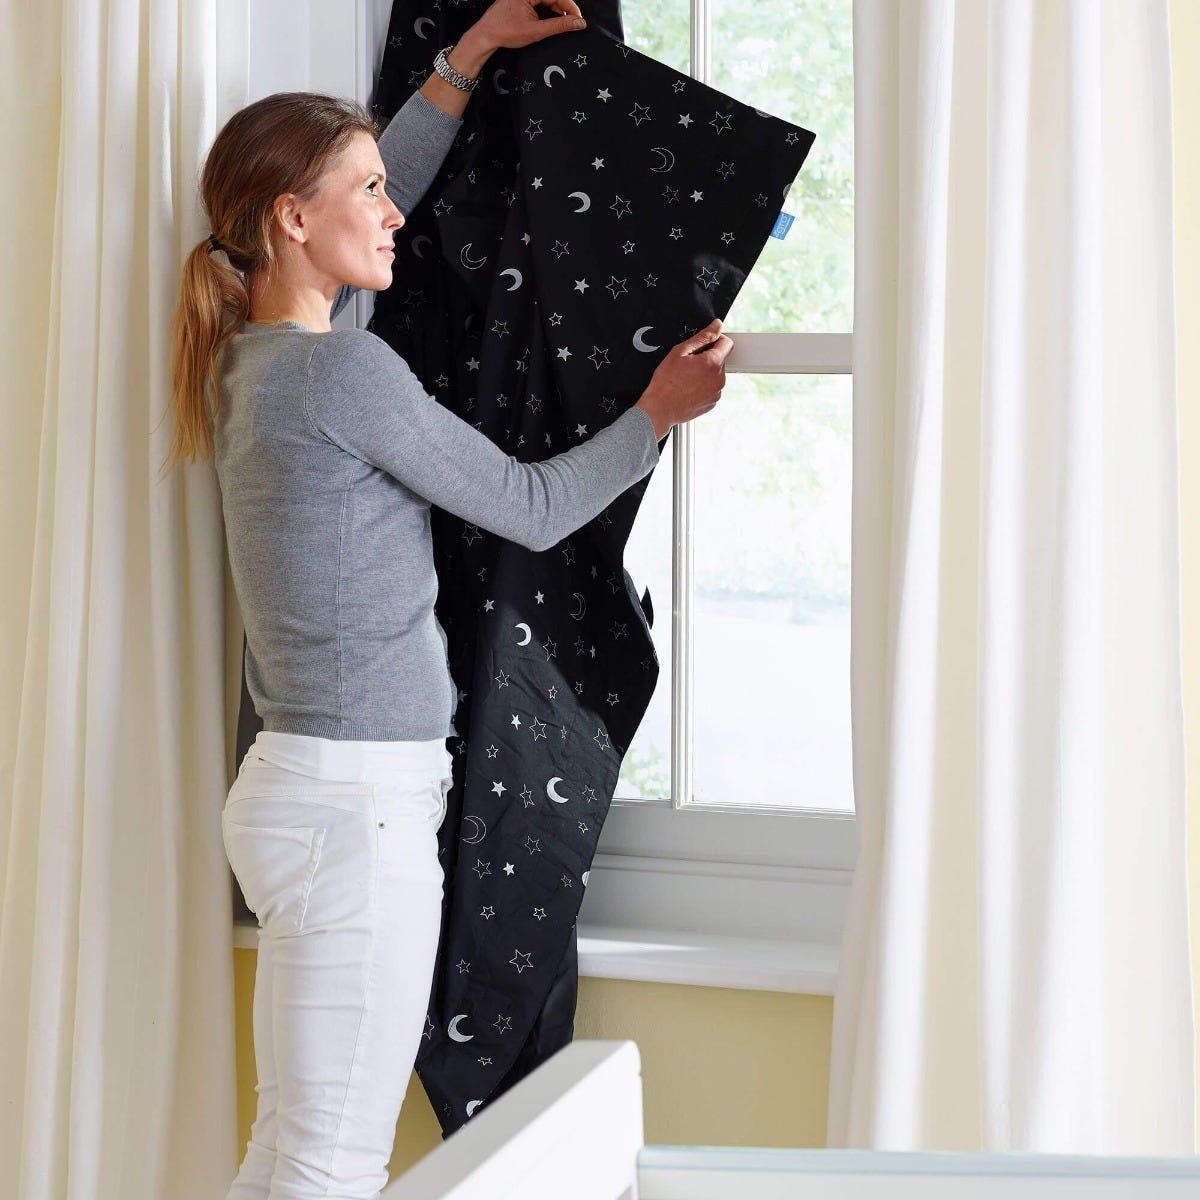 The Gro Company Black Gro Anywhere Blind Curtain